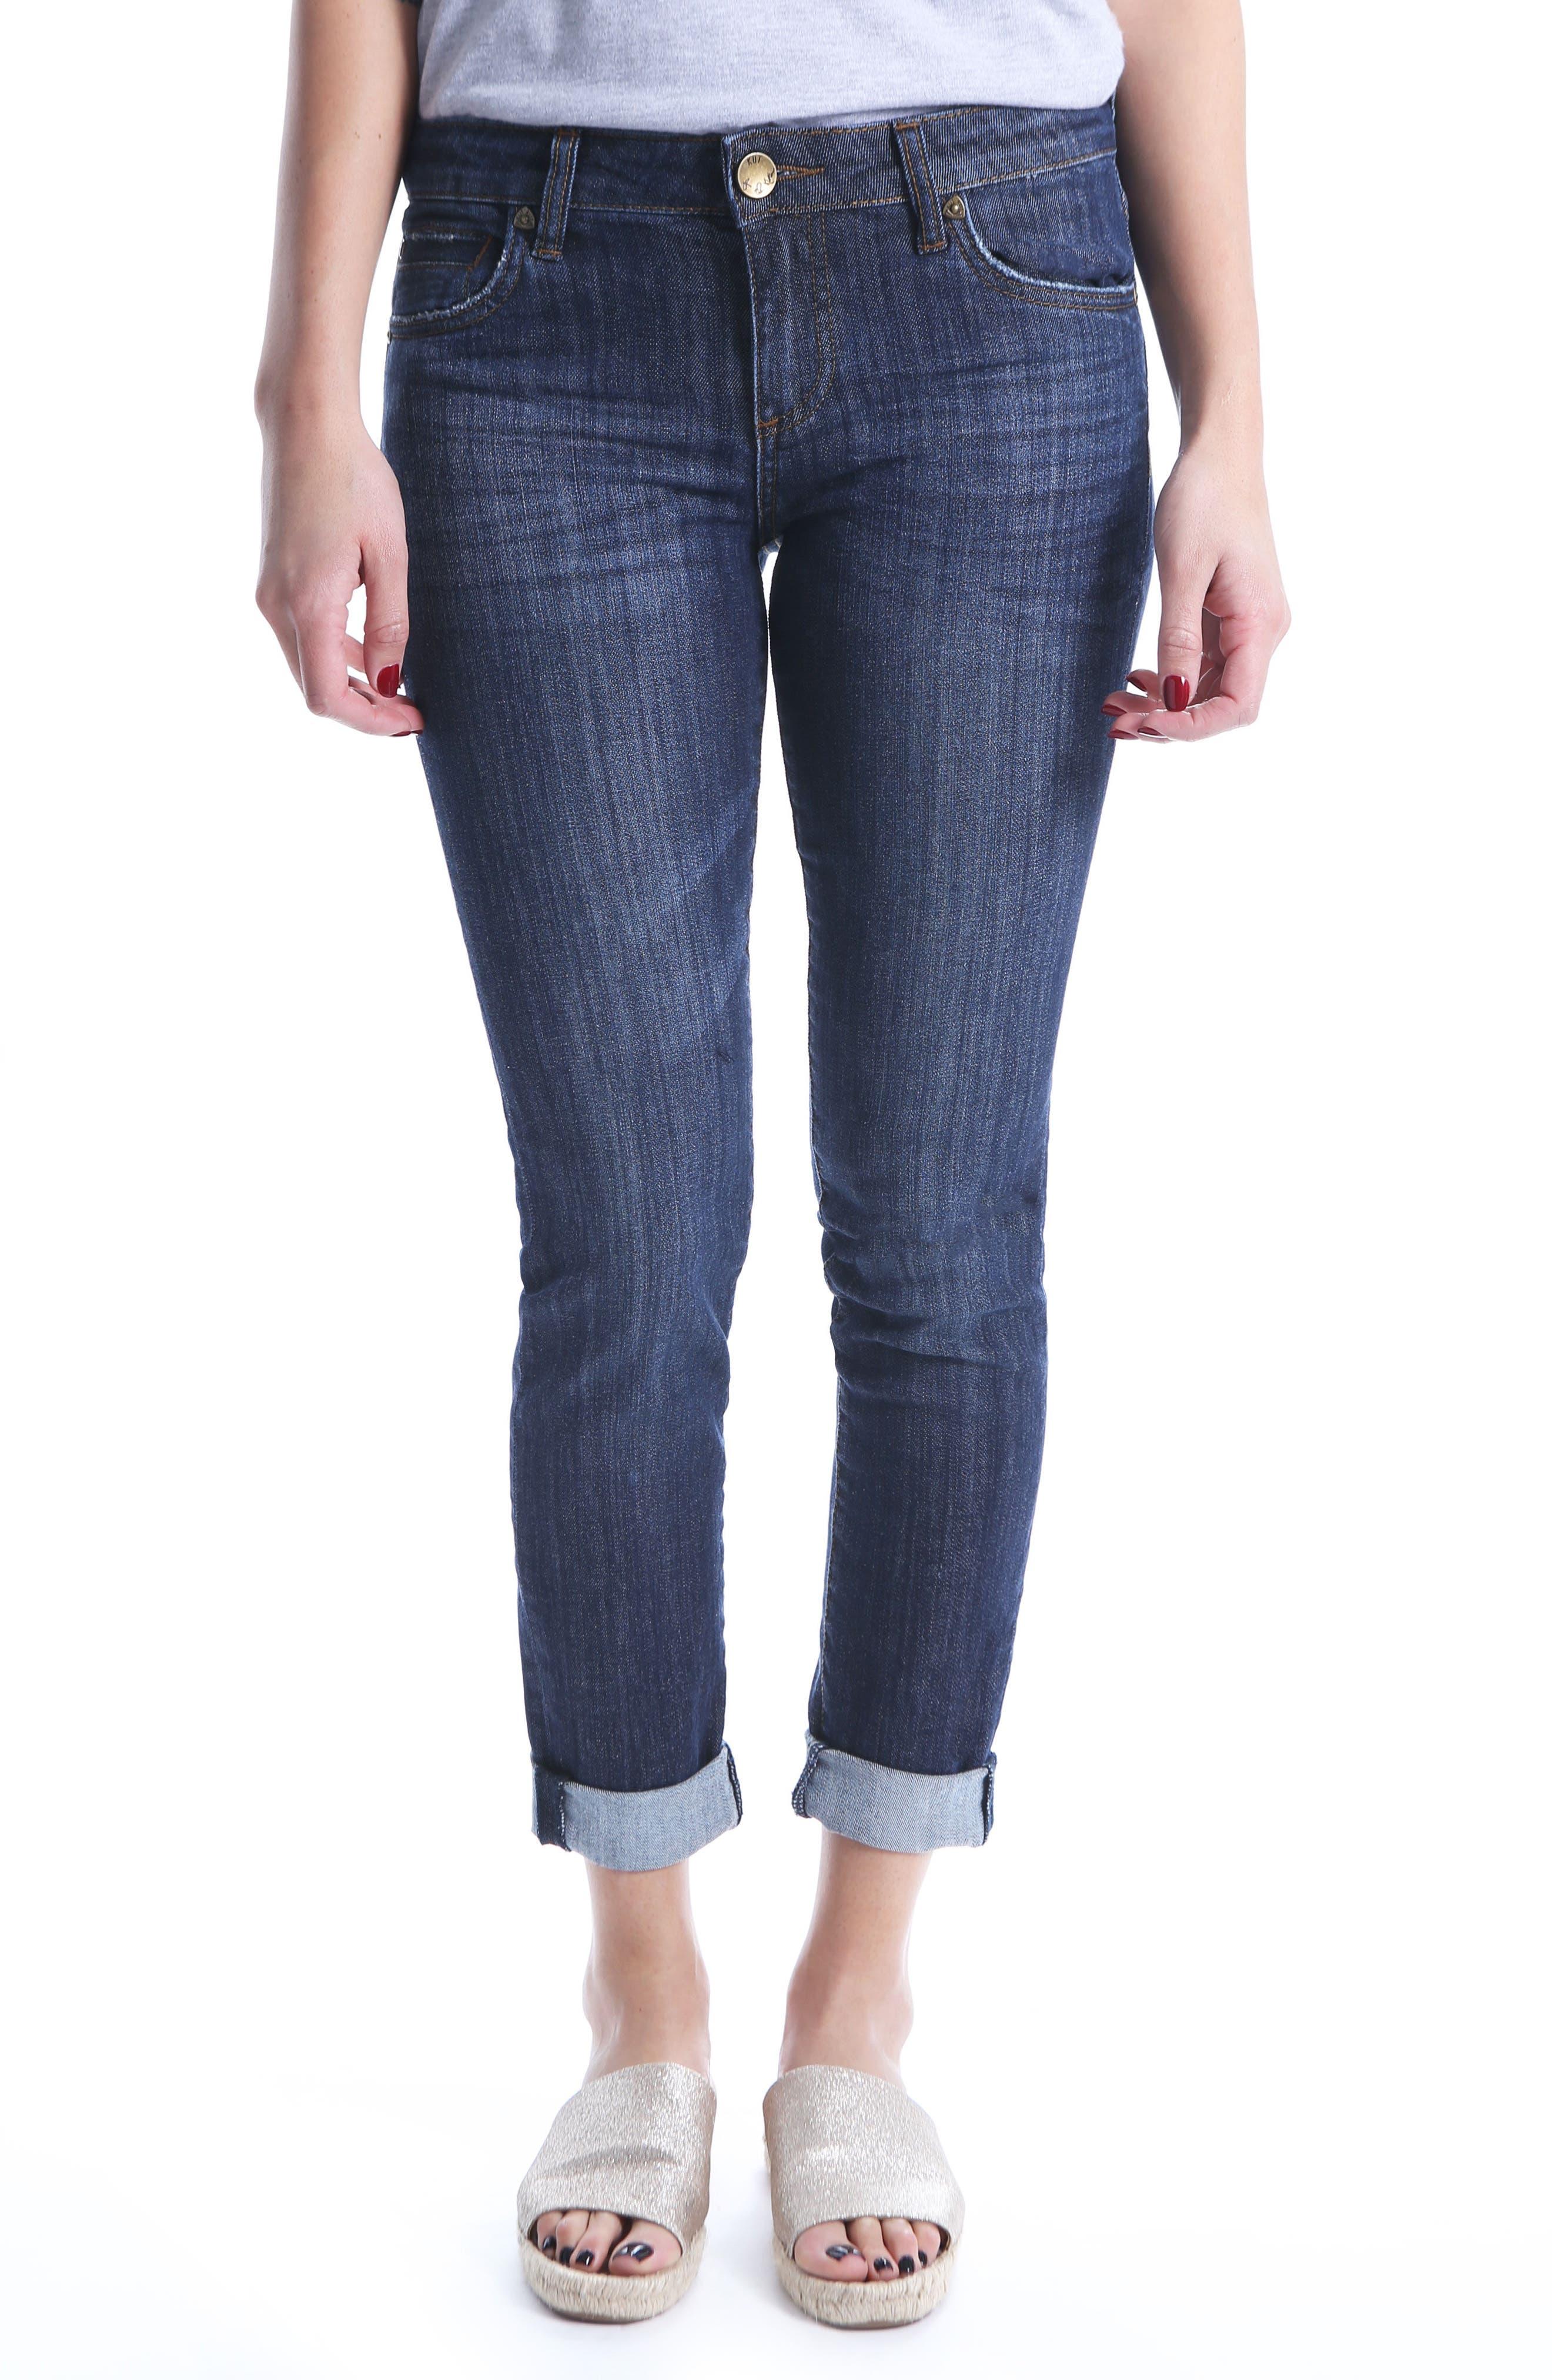 Main Image - KUT from the Kloth Catherine Boyfriend Jeans (Regular & Petite) (Enticement)